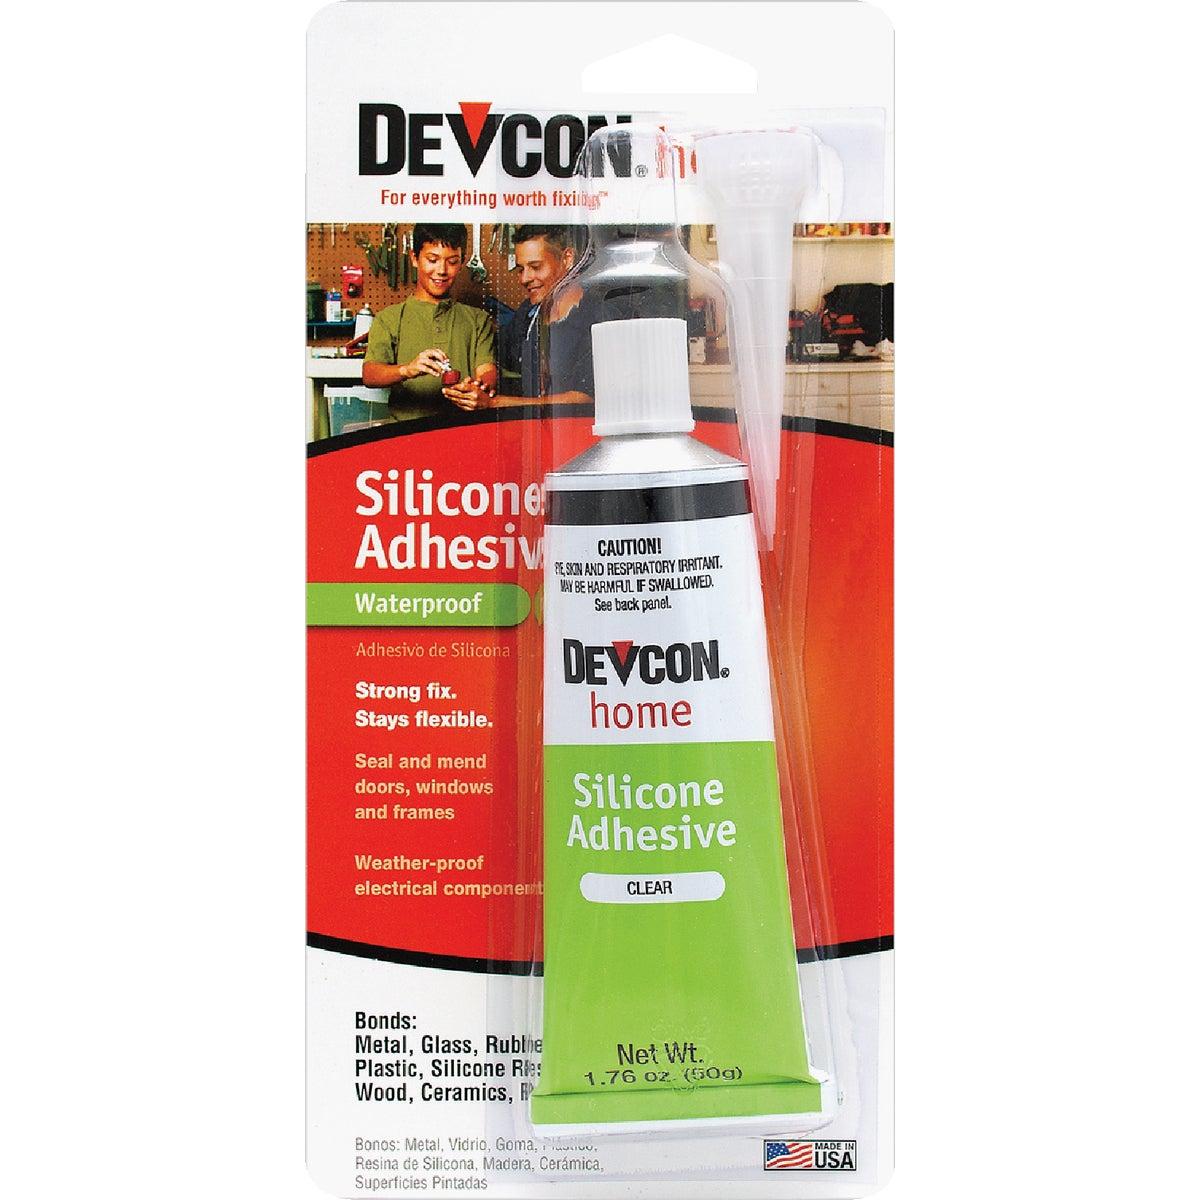 ITW Consumer/ Devcon 1OZ SILICONE ADHESIVE S-120